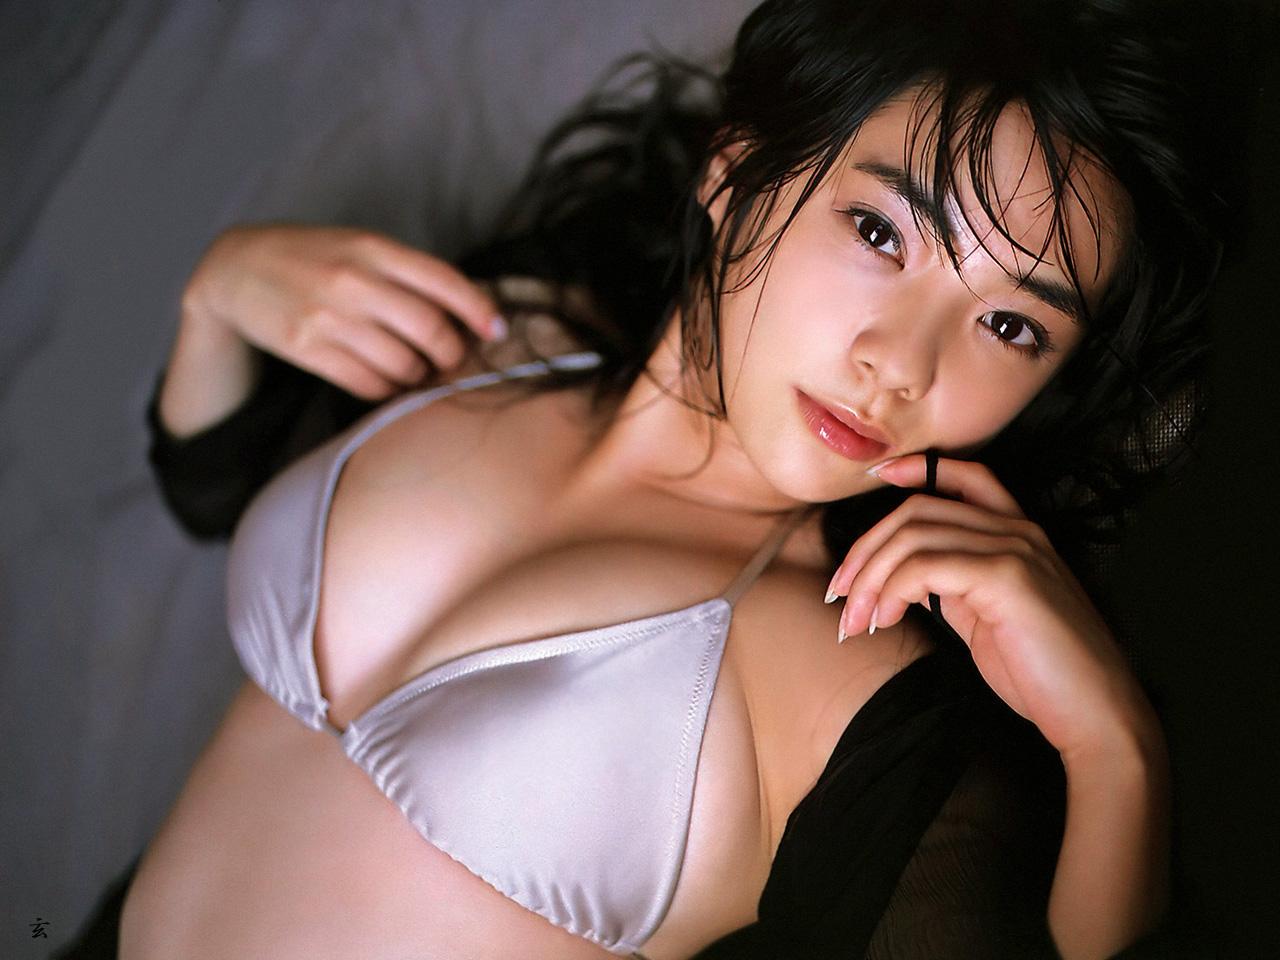 http://blog.cnobi.jp/v1/blog/user/a8c5c06266ed65ea9b67299e90592fa7/1341508319